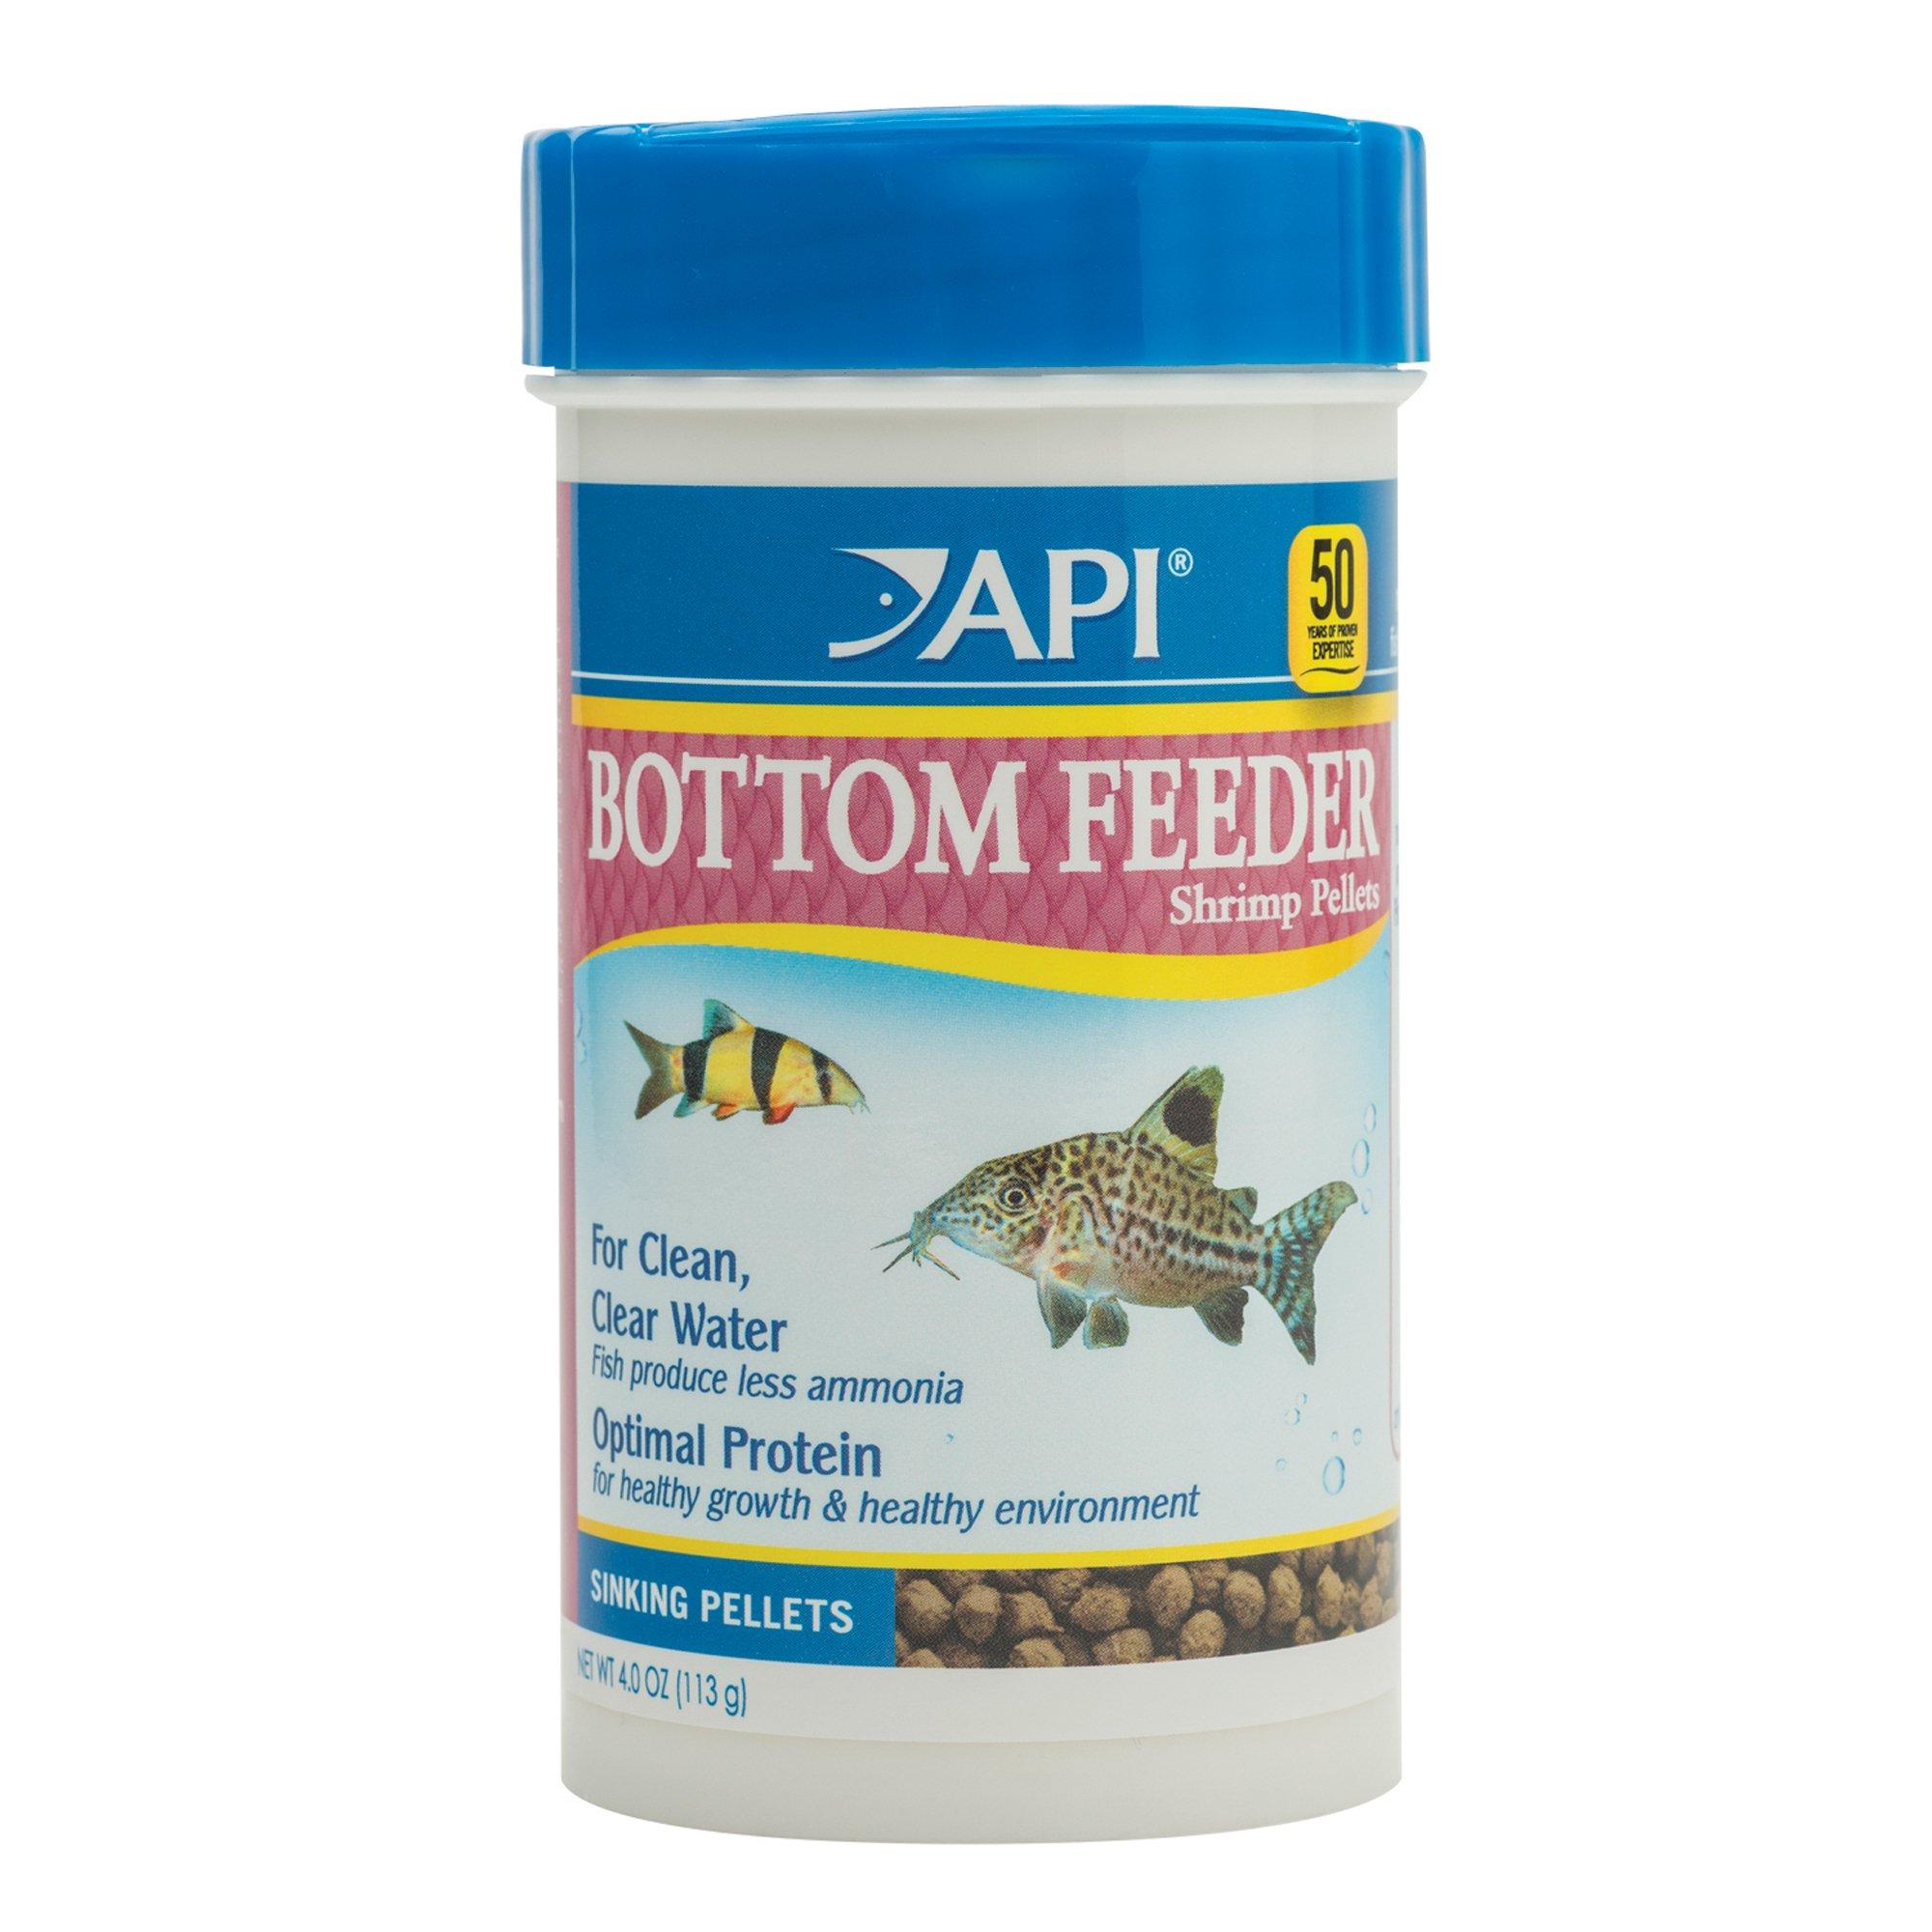 Api bottom feeder shrimp pellets fish food petco for Petco fish food